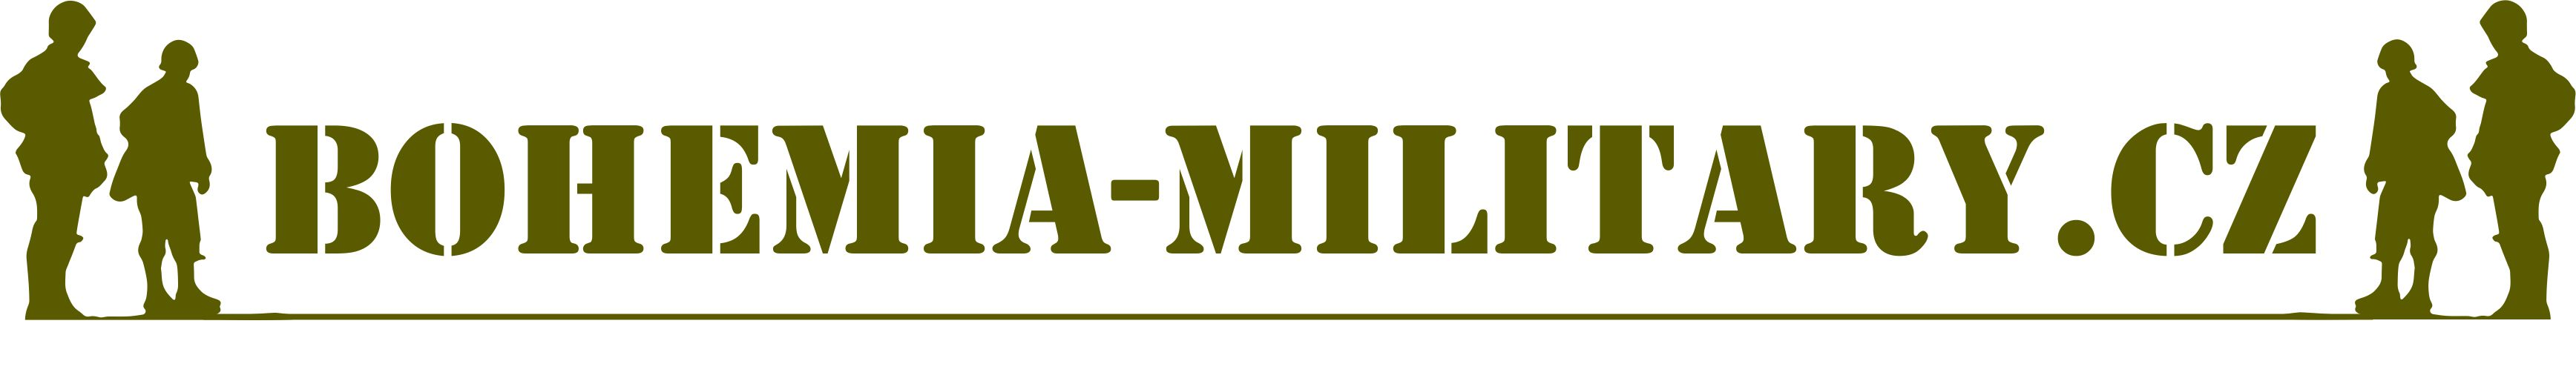 BOHEMIA-MILITARY.CZ